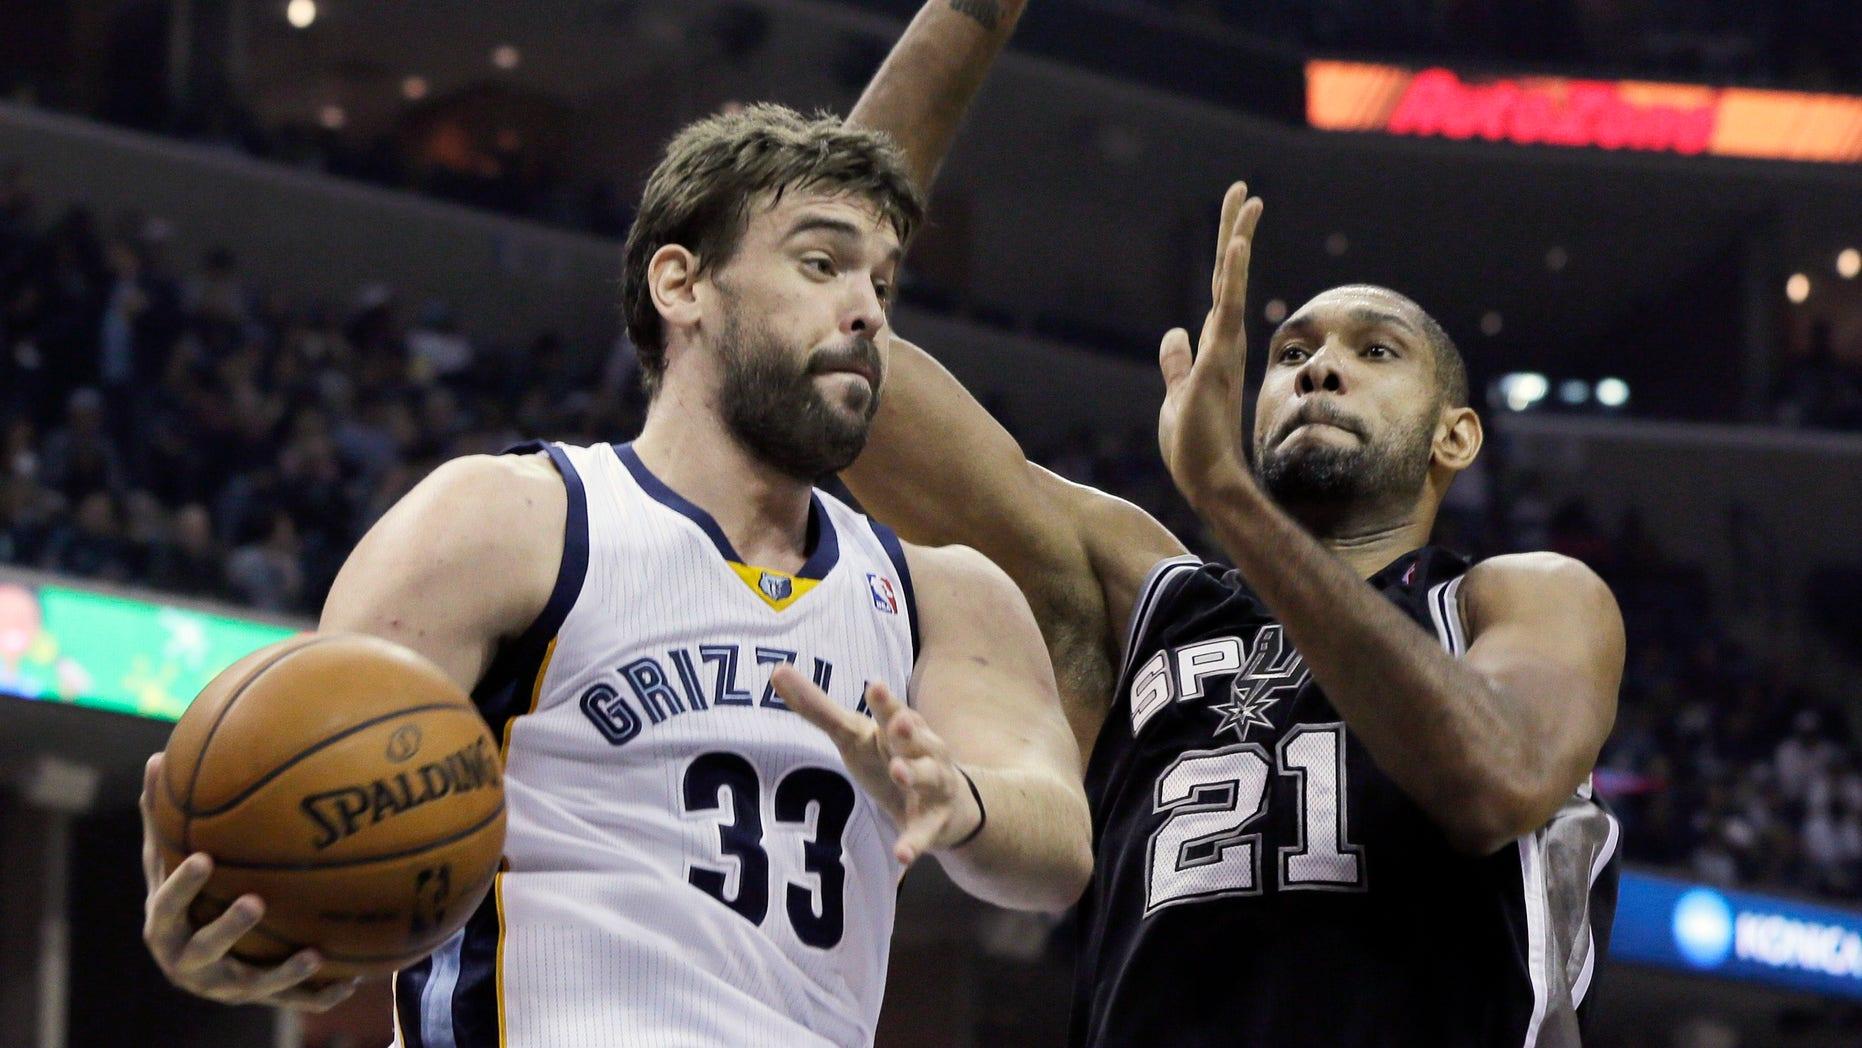 San Antonio Spurs' Tim Duncan (21), of U.S. Virgin Islands, defends against Memphis Grizzlies' Marc Gasol (33), of Spain, in the first half of an NBA basketball game in Memphis, Tenn., Friday, Nov. 22, 2013. (AP Photo/Danny Johnston)